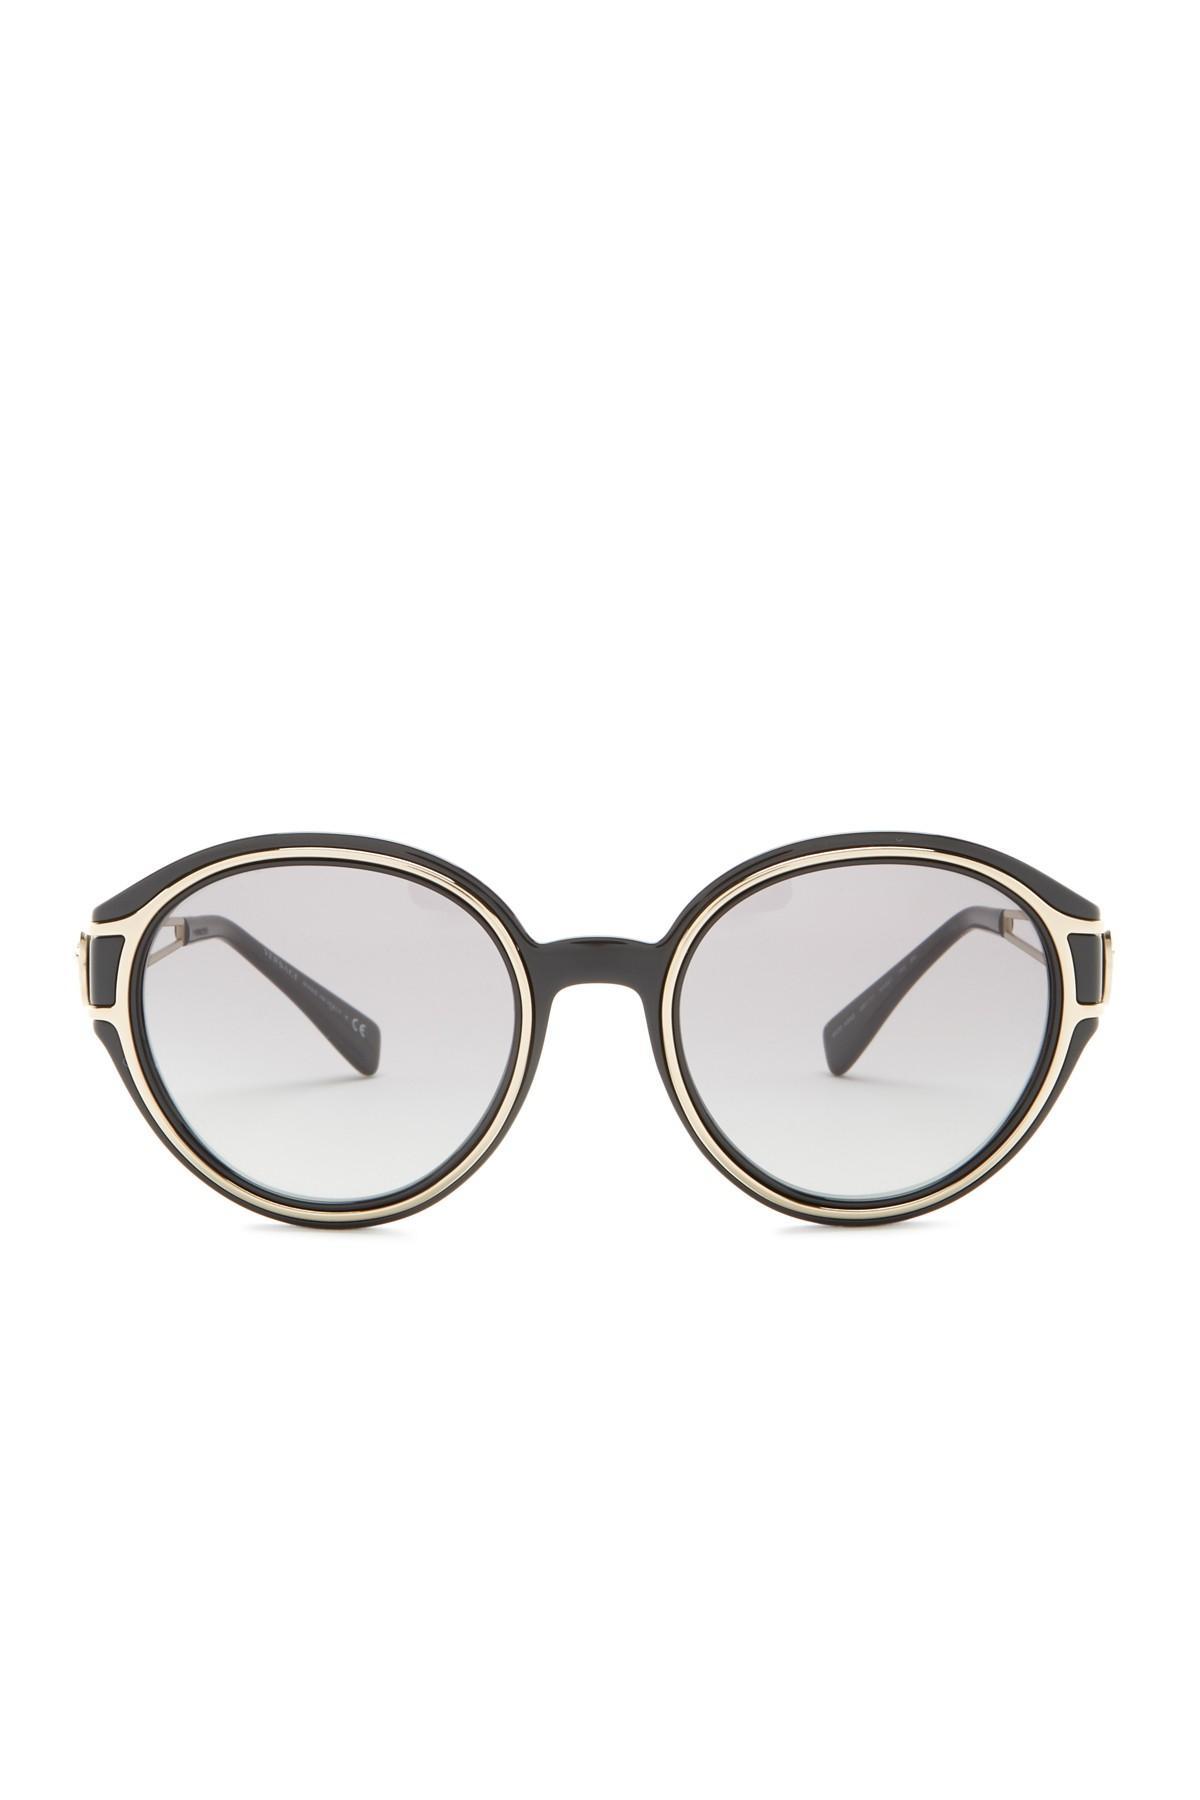 c177e681d5826 Versace - Black 53mm Round Sunglasses - Lyst. View fullscreen